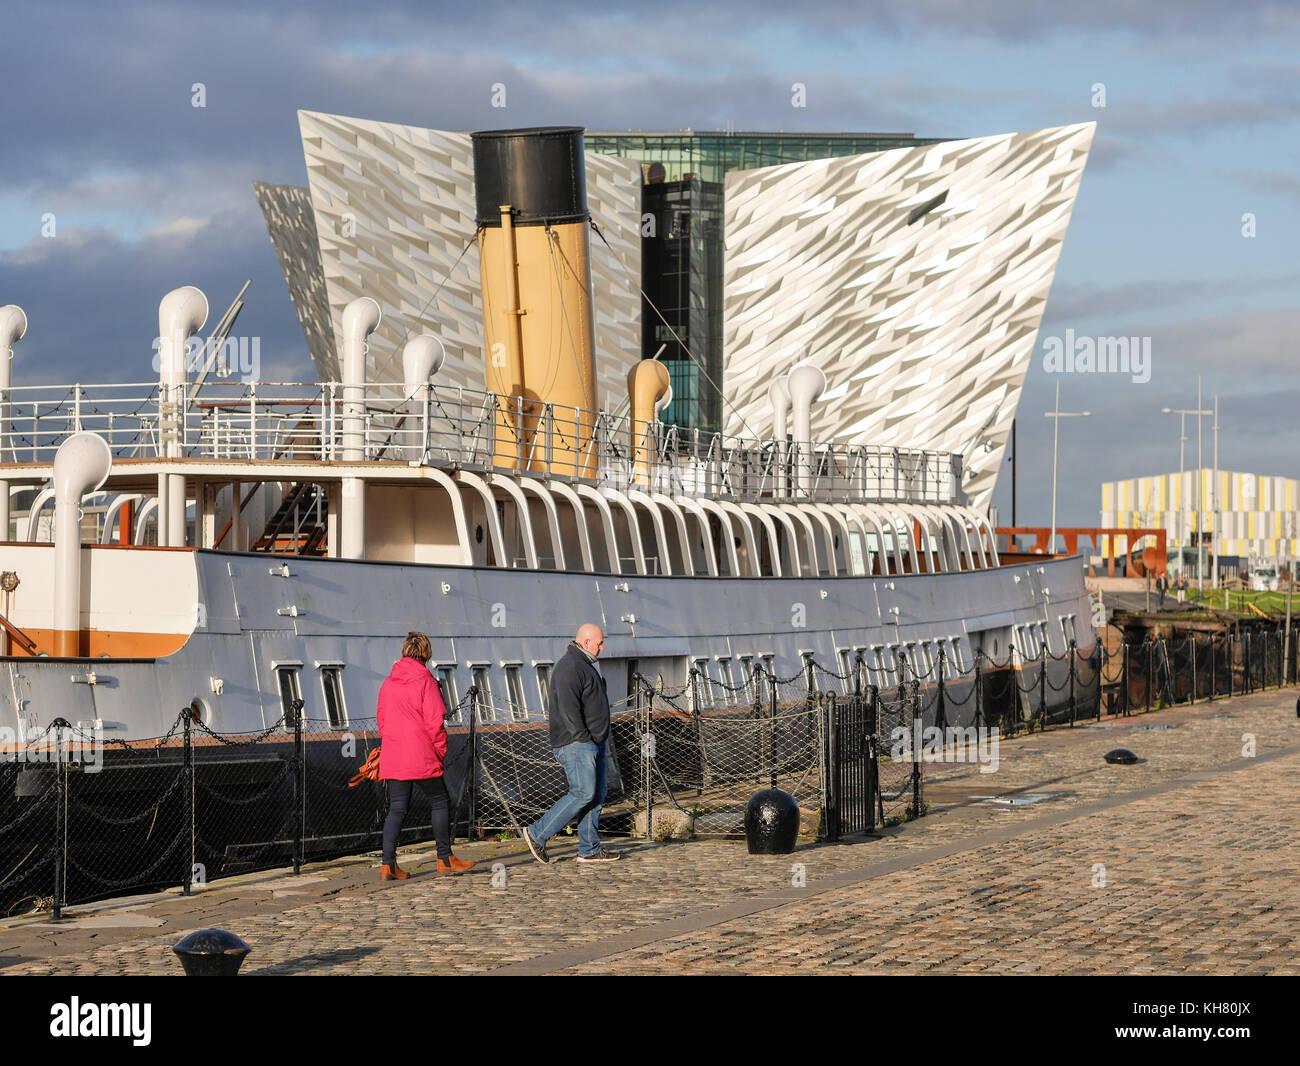 Belfast, Northern Ireland, UK. 16th Nov, 2017. UK weather: SS Nomadic and Titanic Belfast in the sun as Belfast - Stock Image